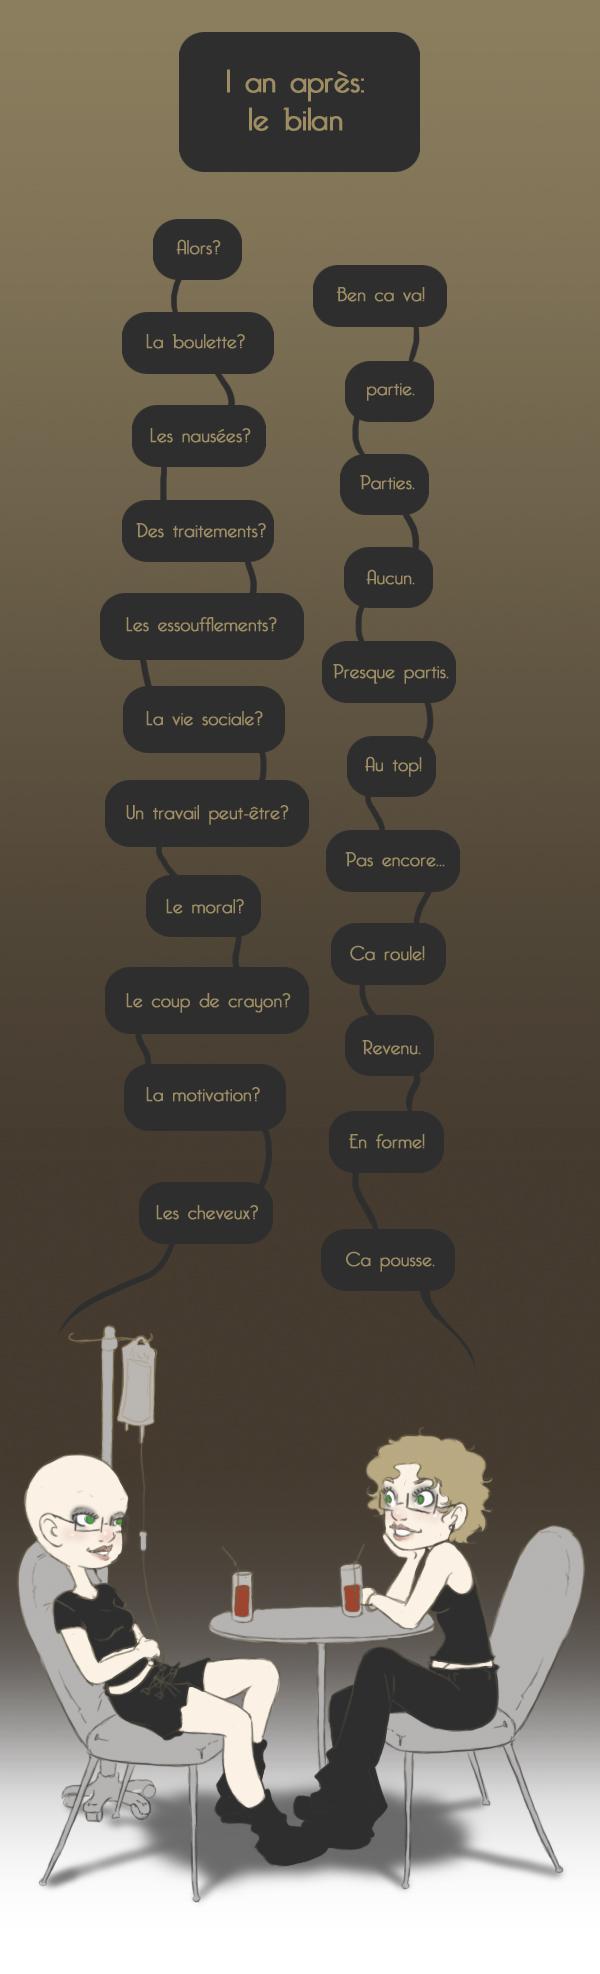 http://sorephene.free.fr/blogBD/617.jpg